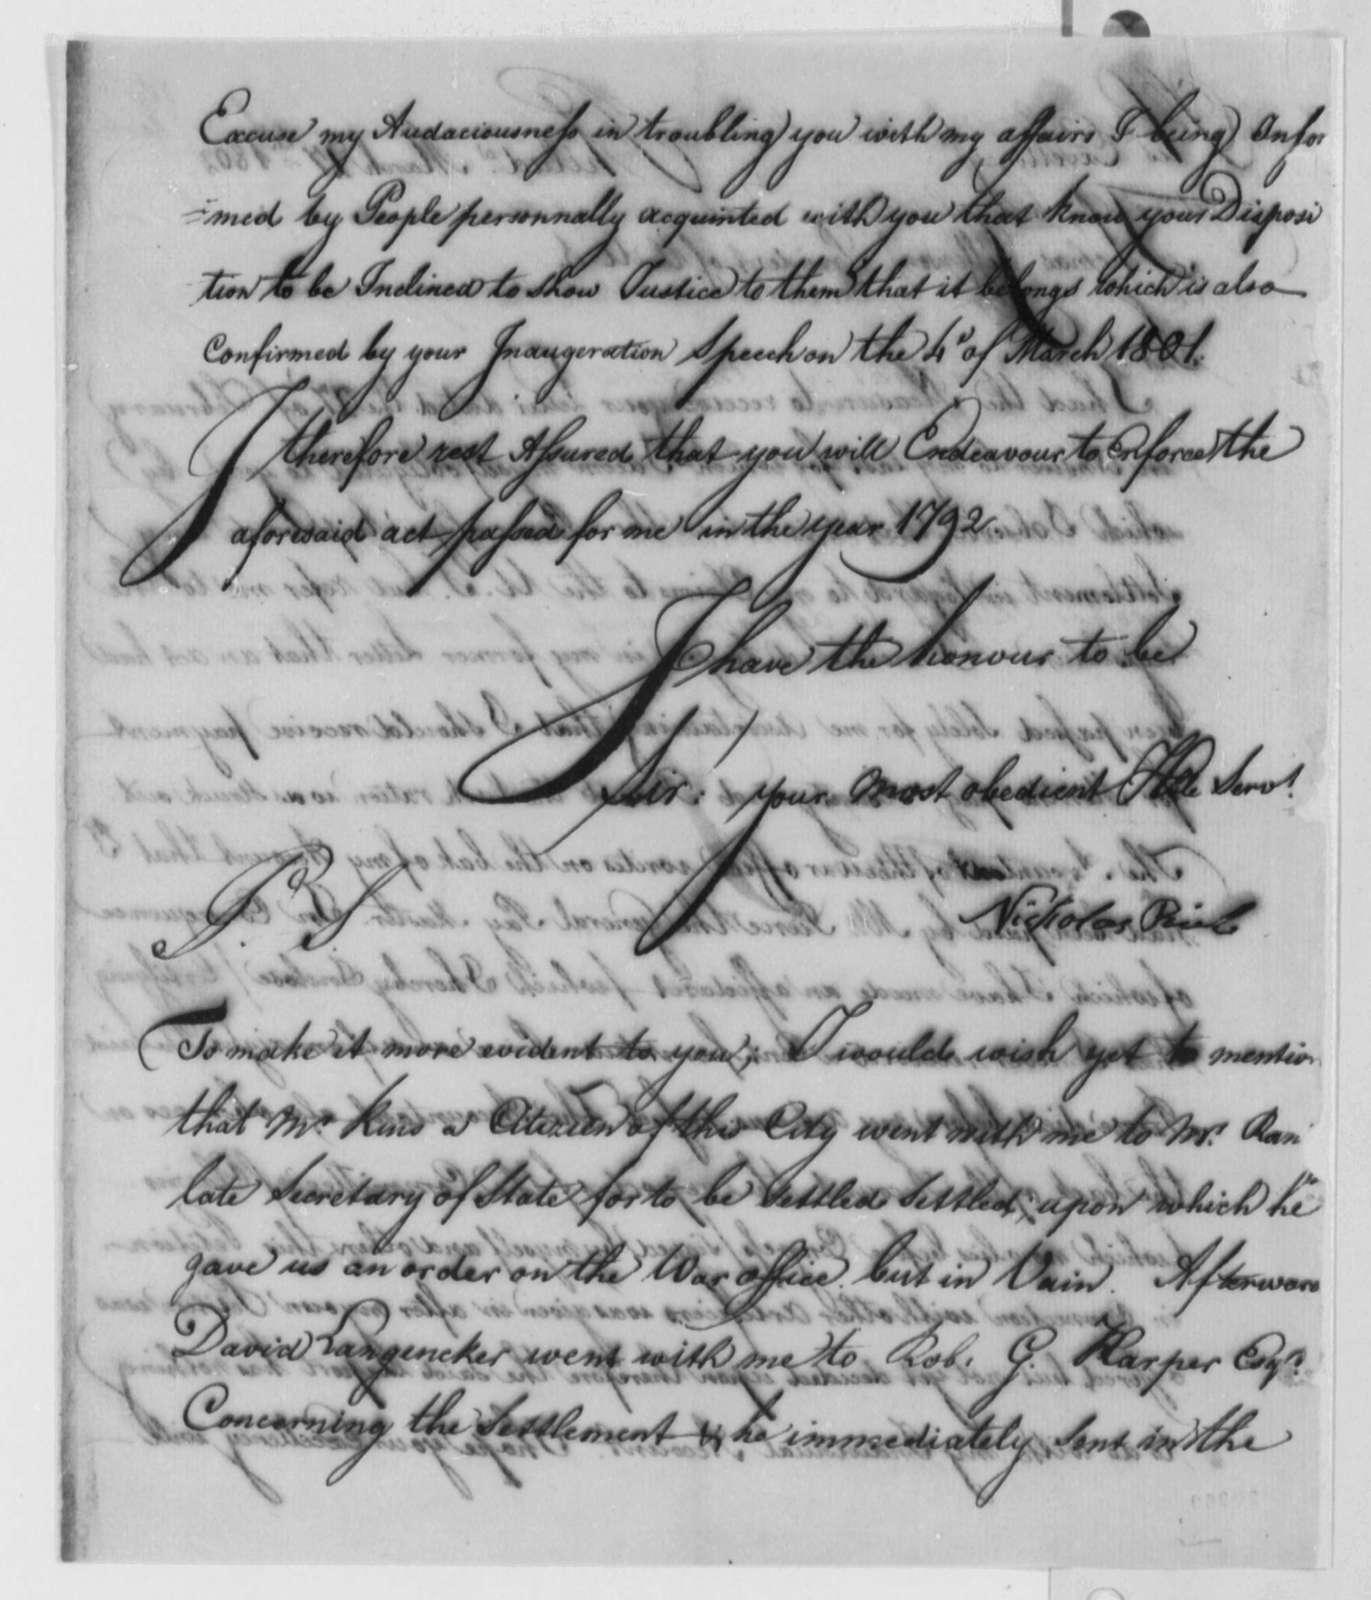 Nicholas Rieb to Thomas Jefferson, March 27, 1802